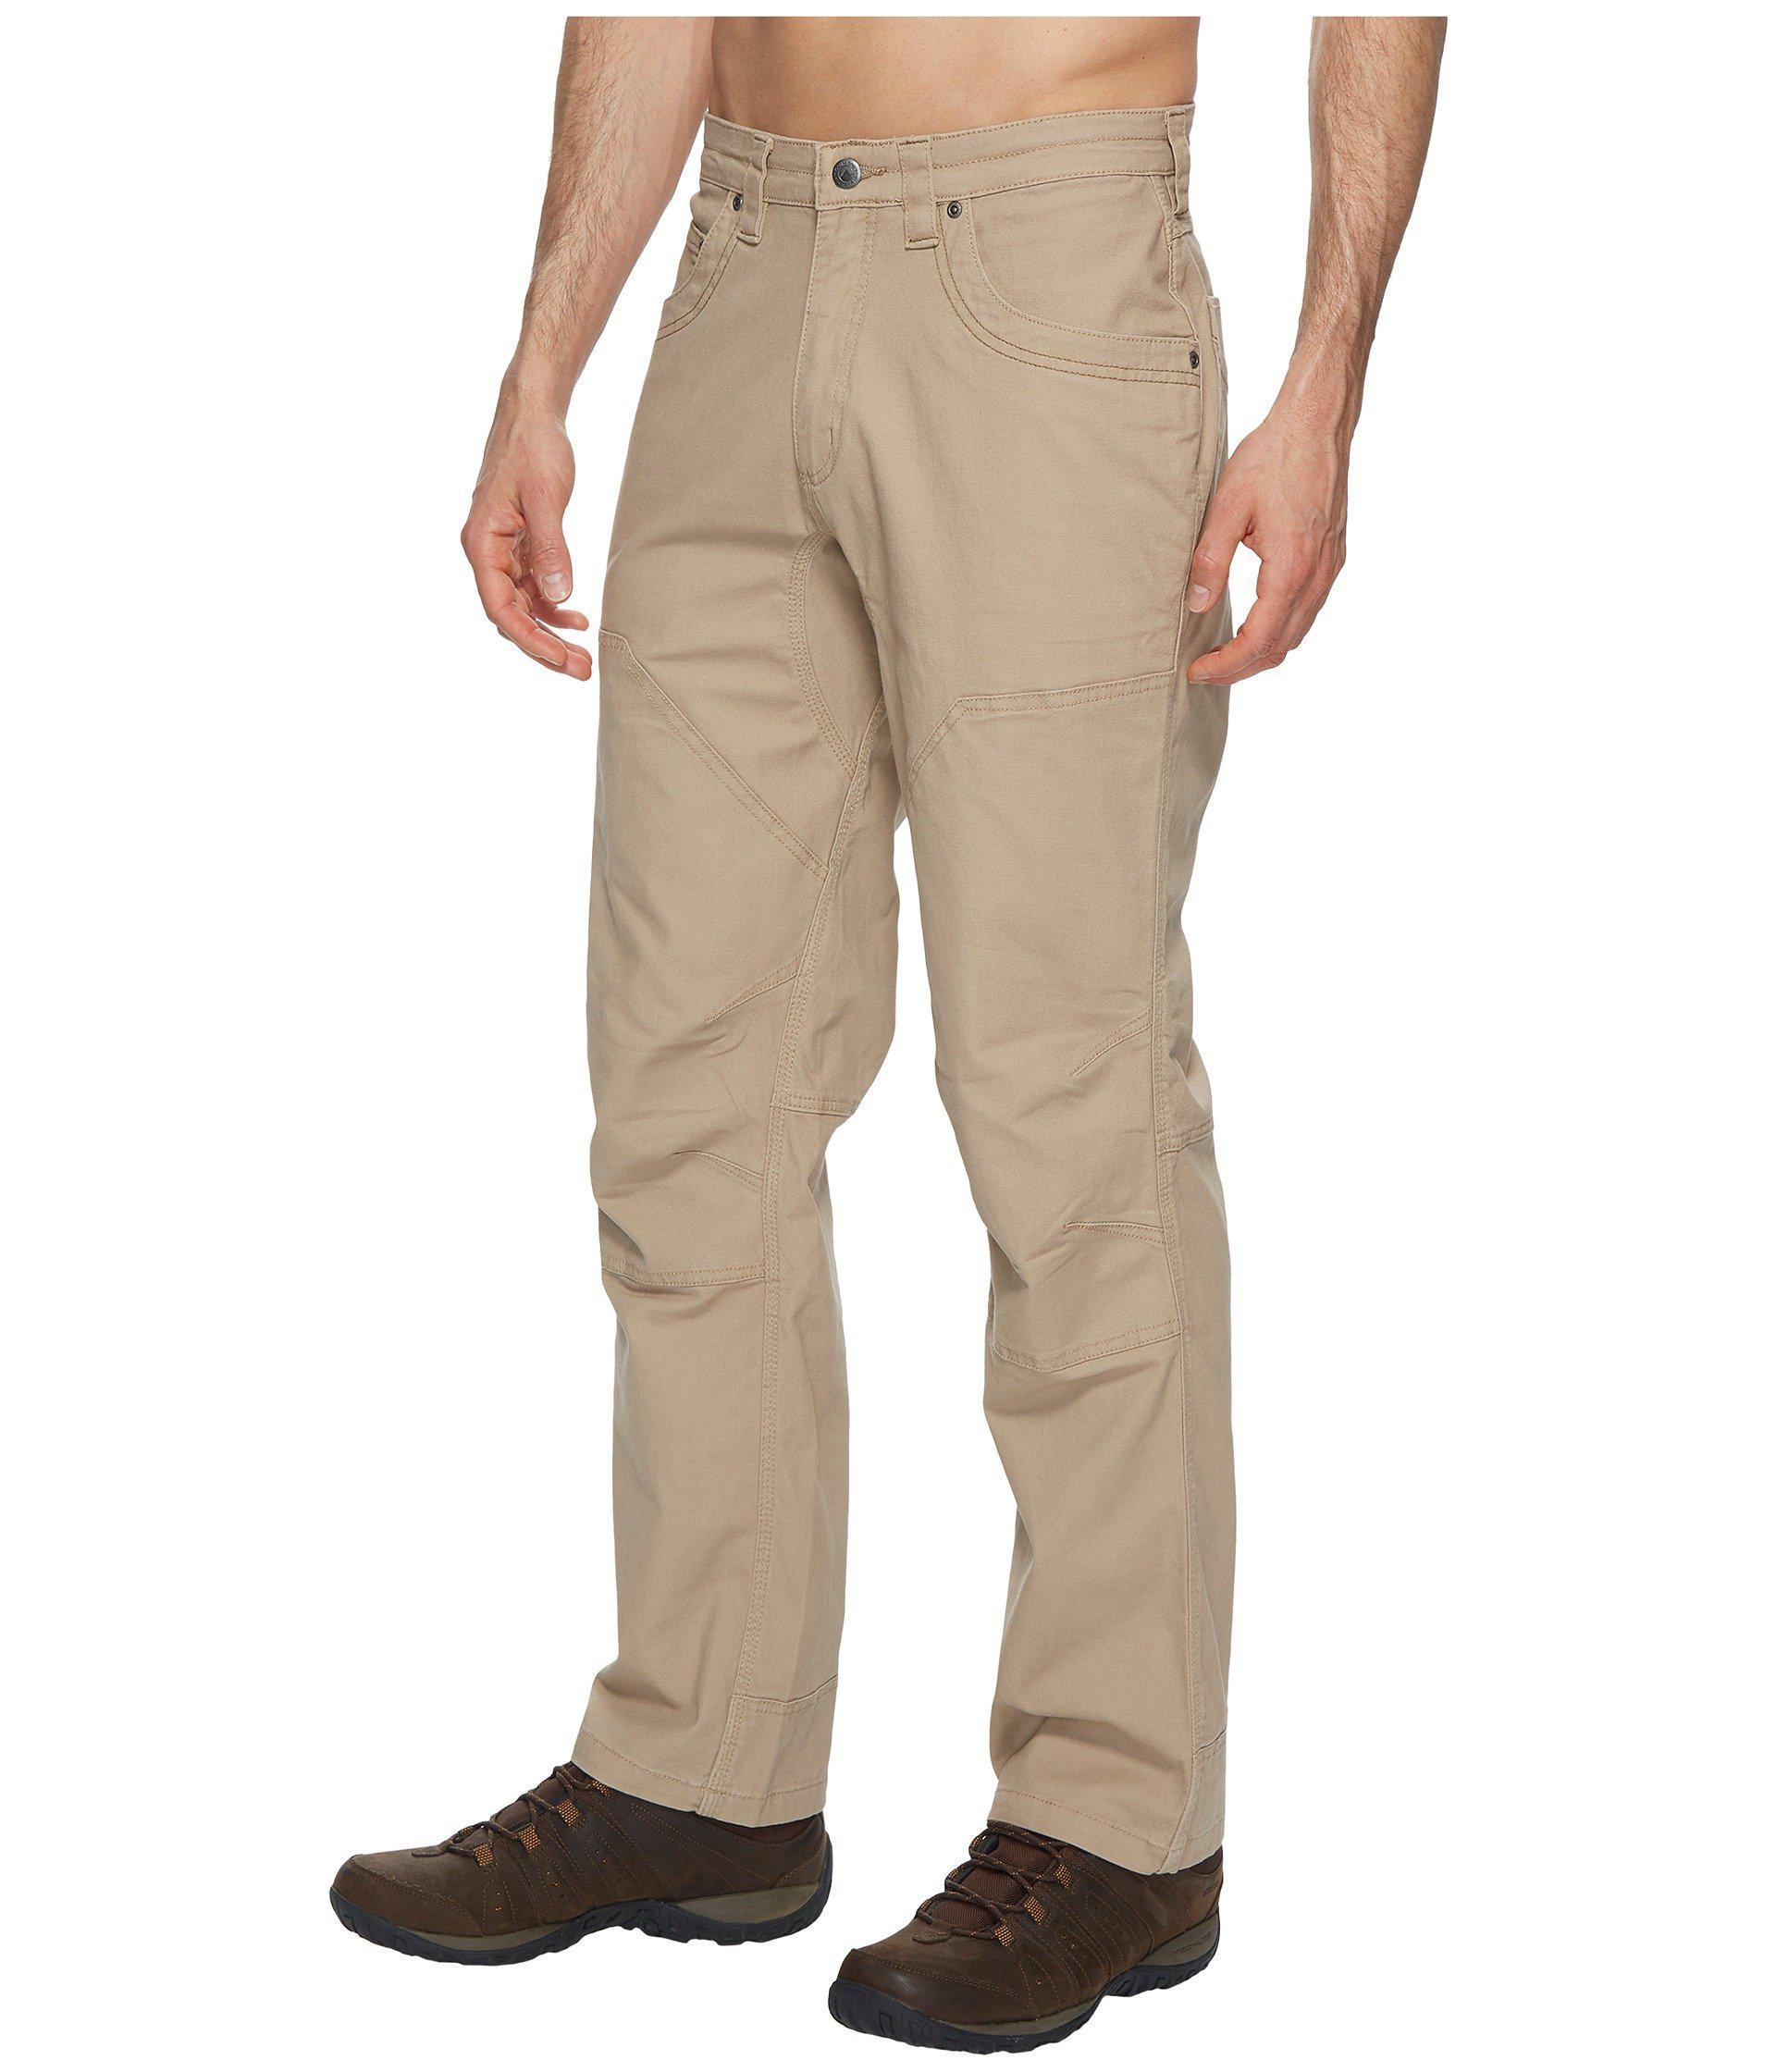 b128fd00 Mountain Khakis Camber 107 Pant (classic Khaki) Men's Casual Pants ...